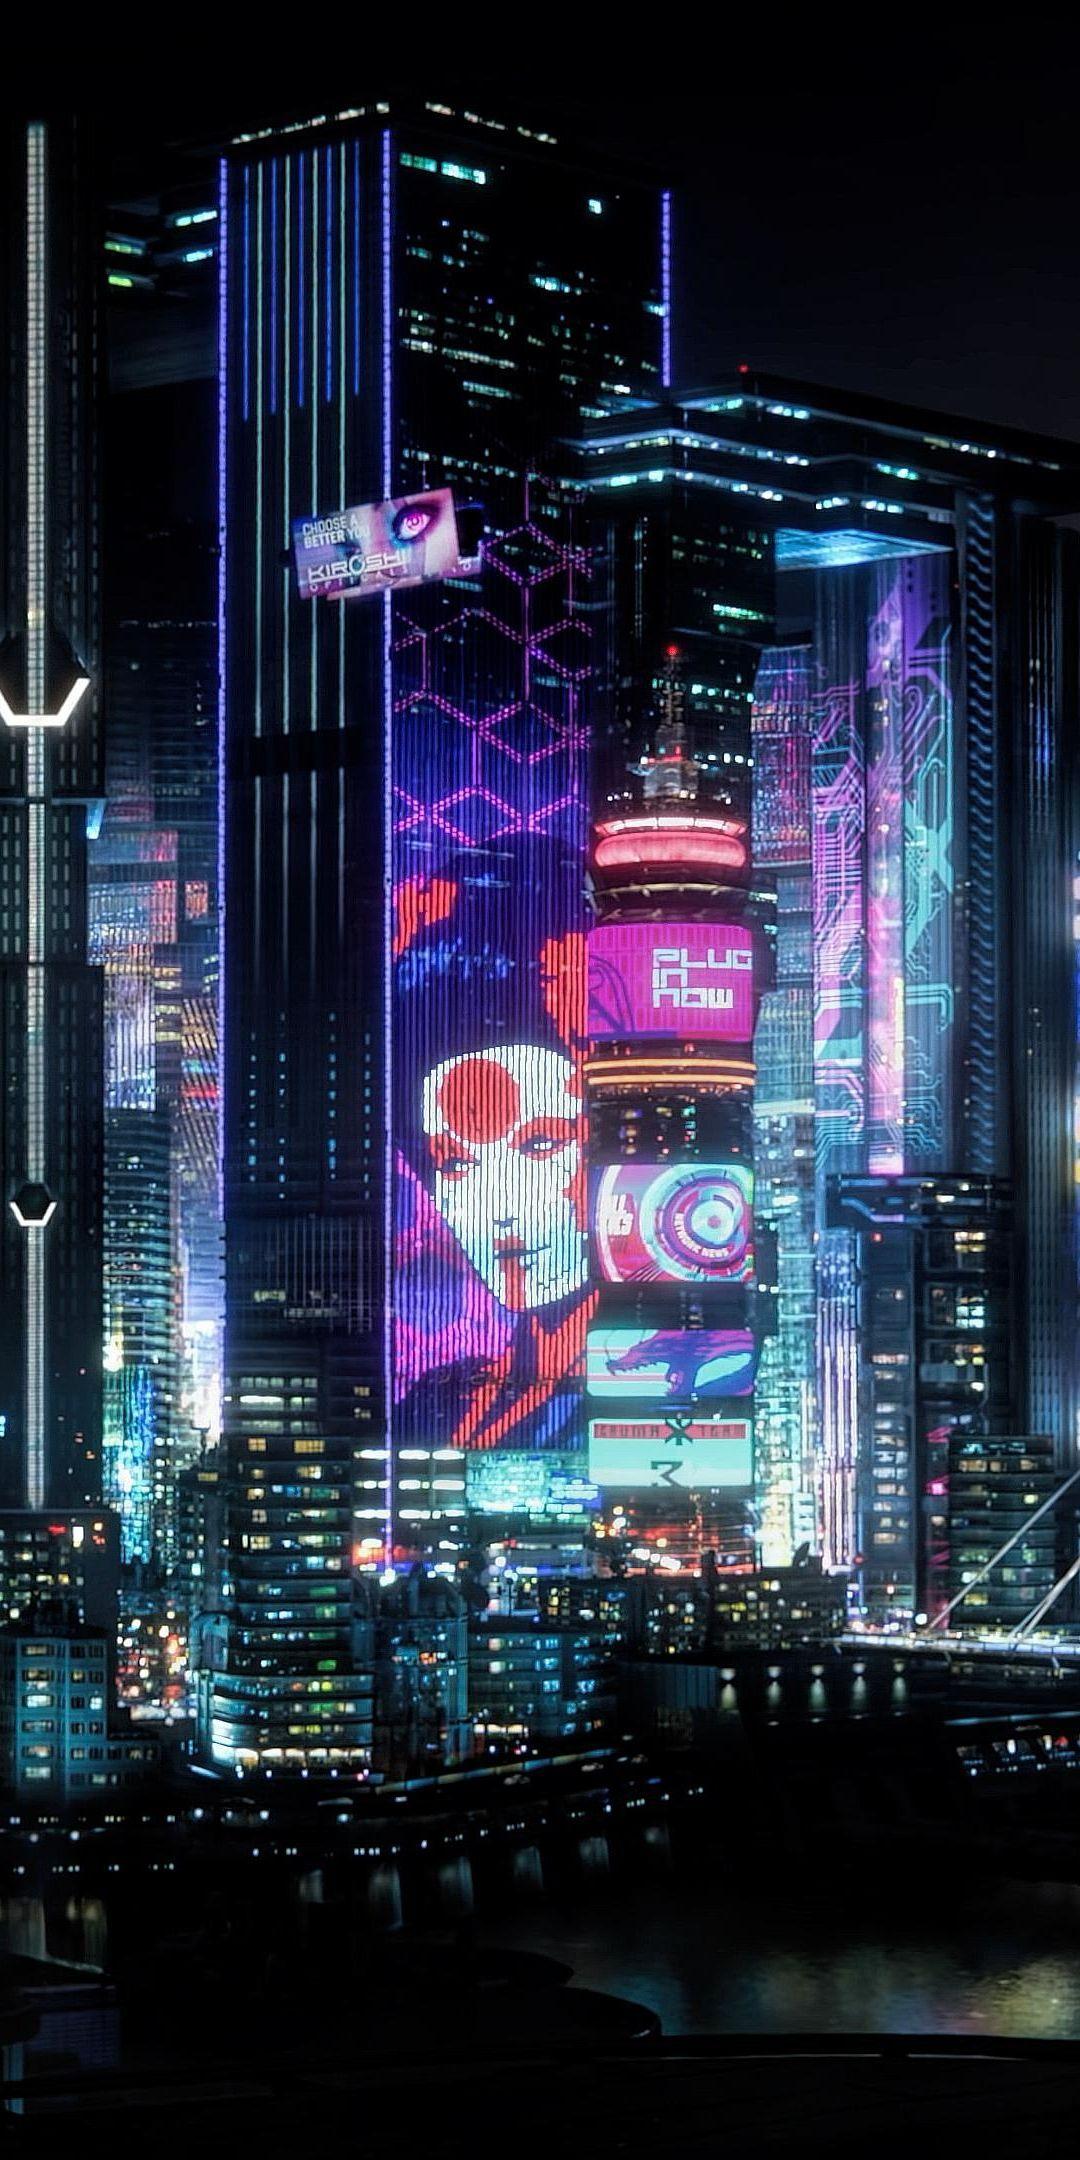 Cyberpunk 2077 Phone Wallpapers Top Free Cyberpunk 2077 Phone Backgrounds Wallpaperaccess In 2020 Phone Backgrounds Cyberpunk 2077 Phone Wallpaper